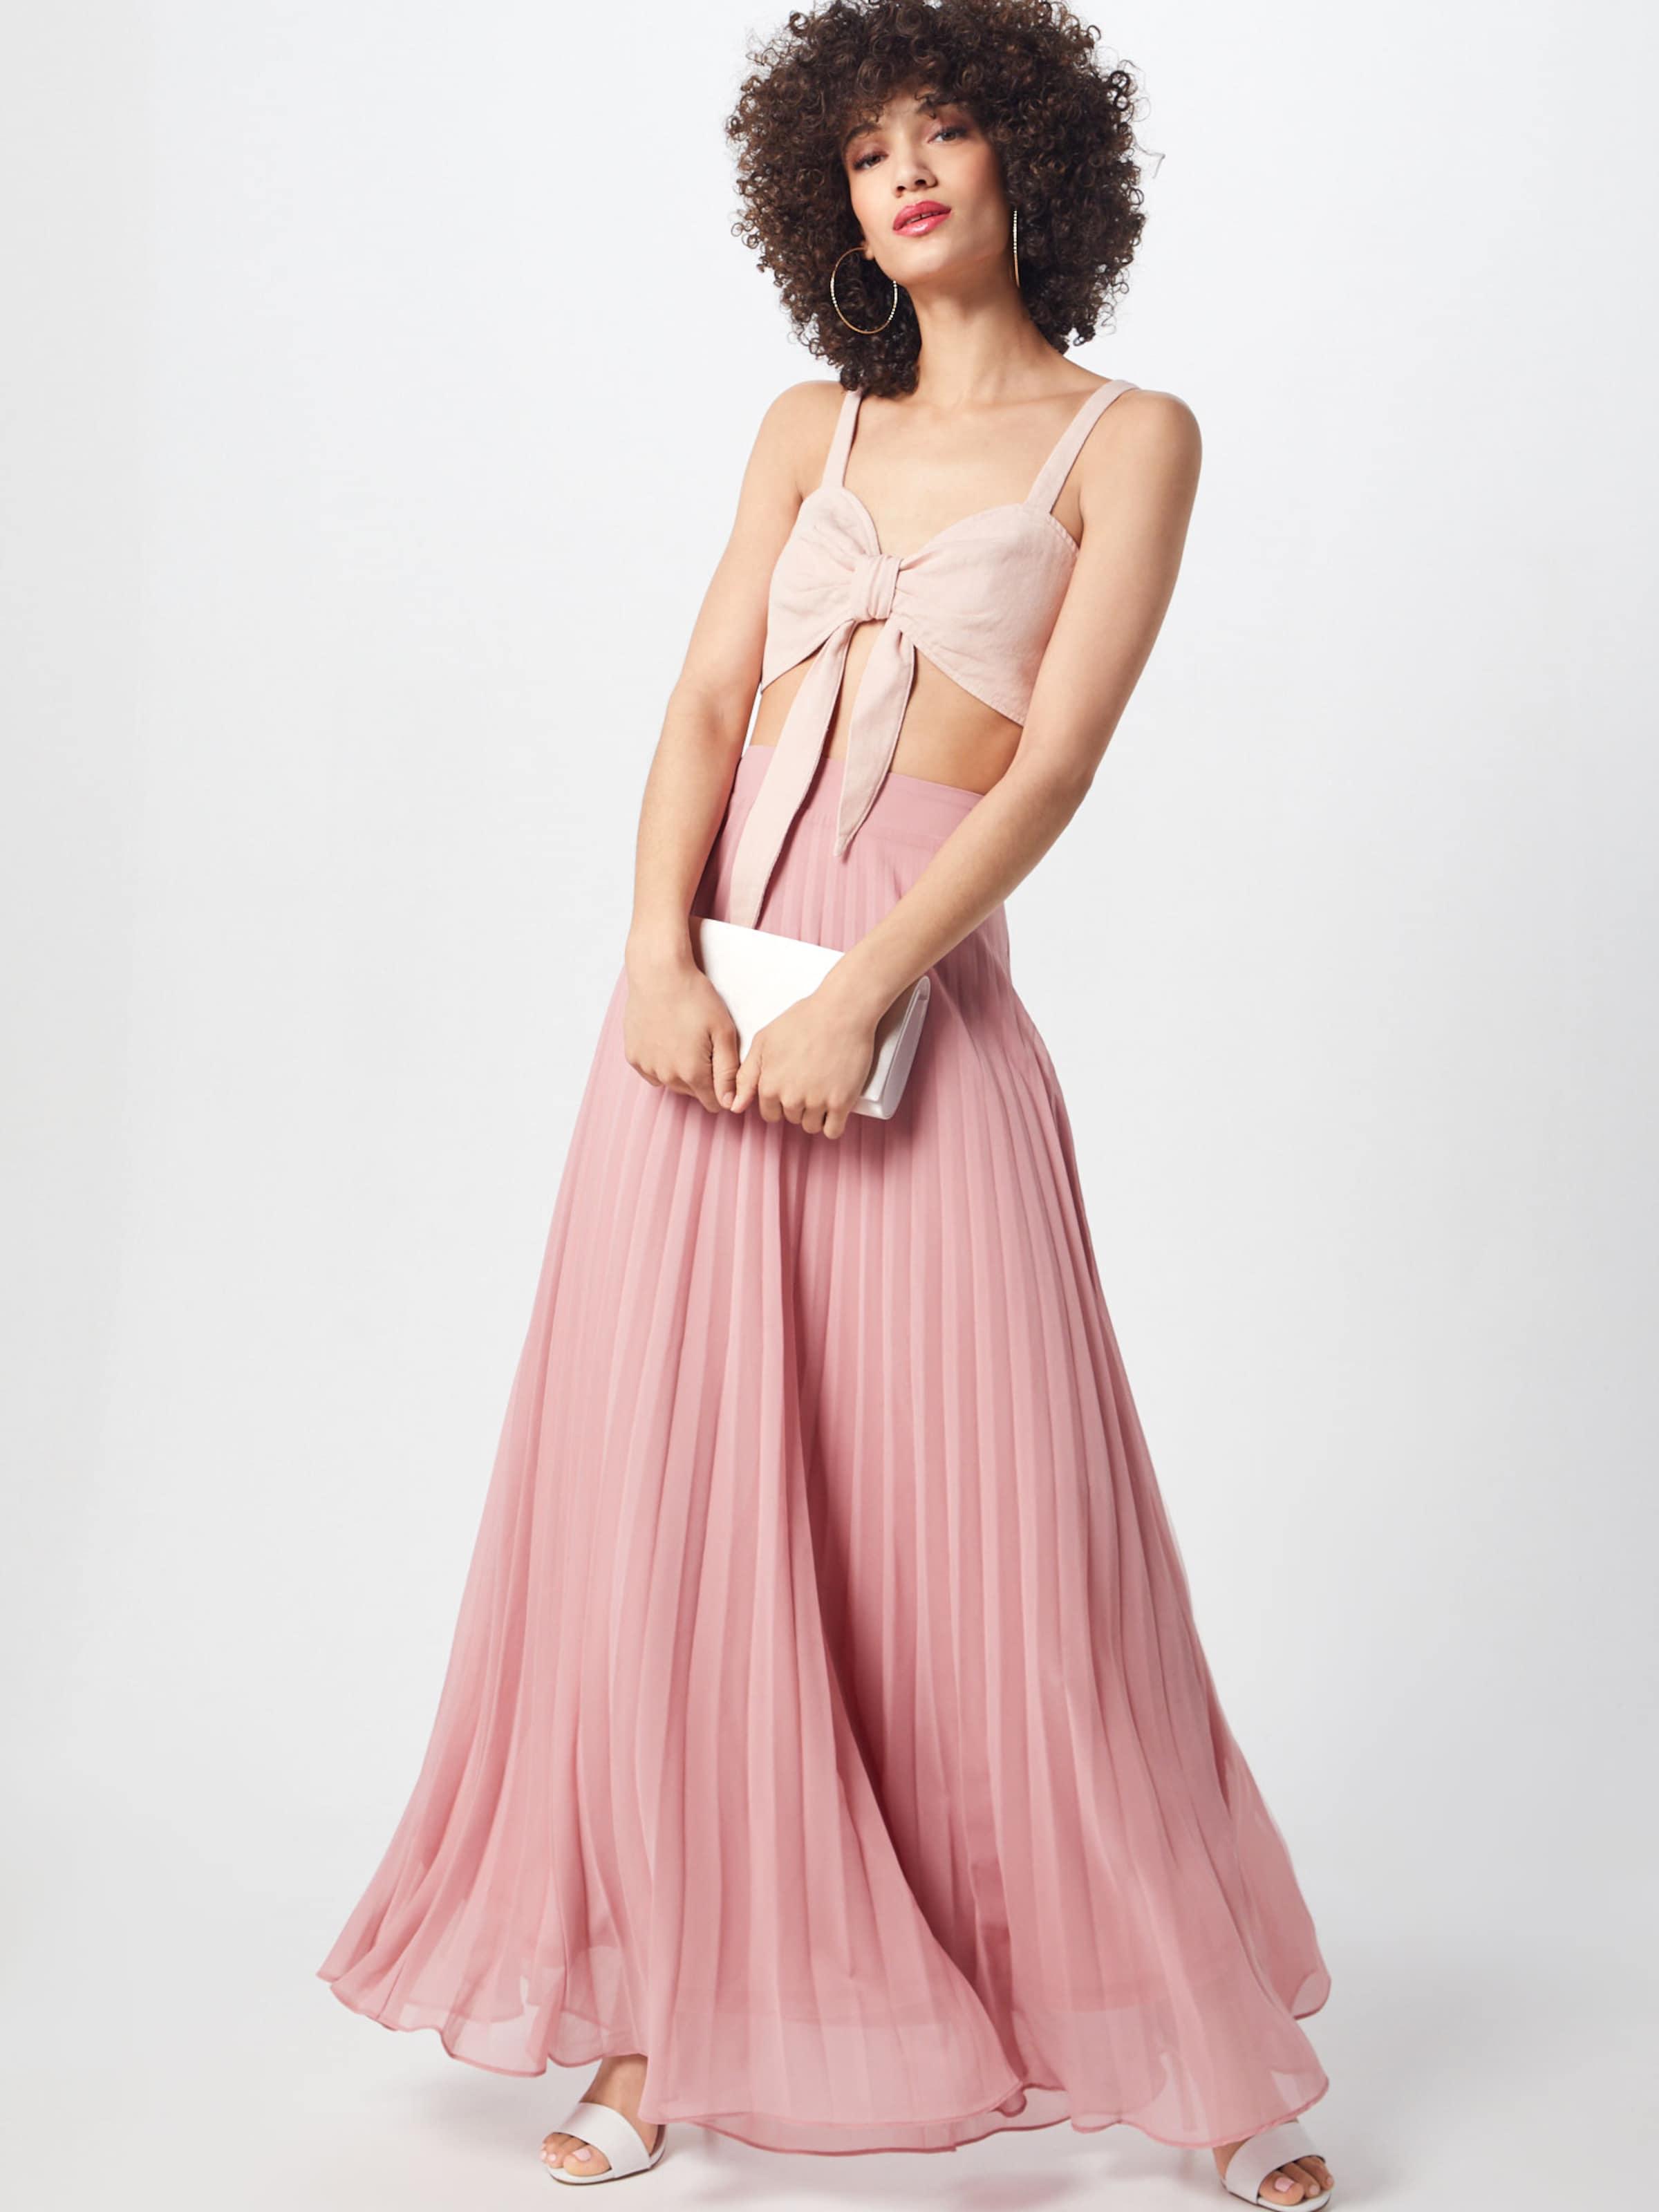 Bralet Ord En Haut 'tie Co Front Pink' Rose Missguided F1TKJcl